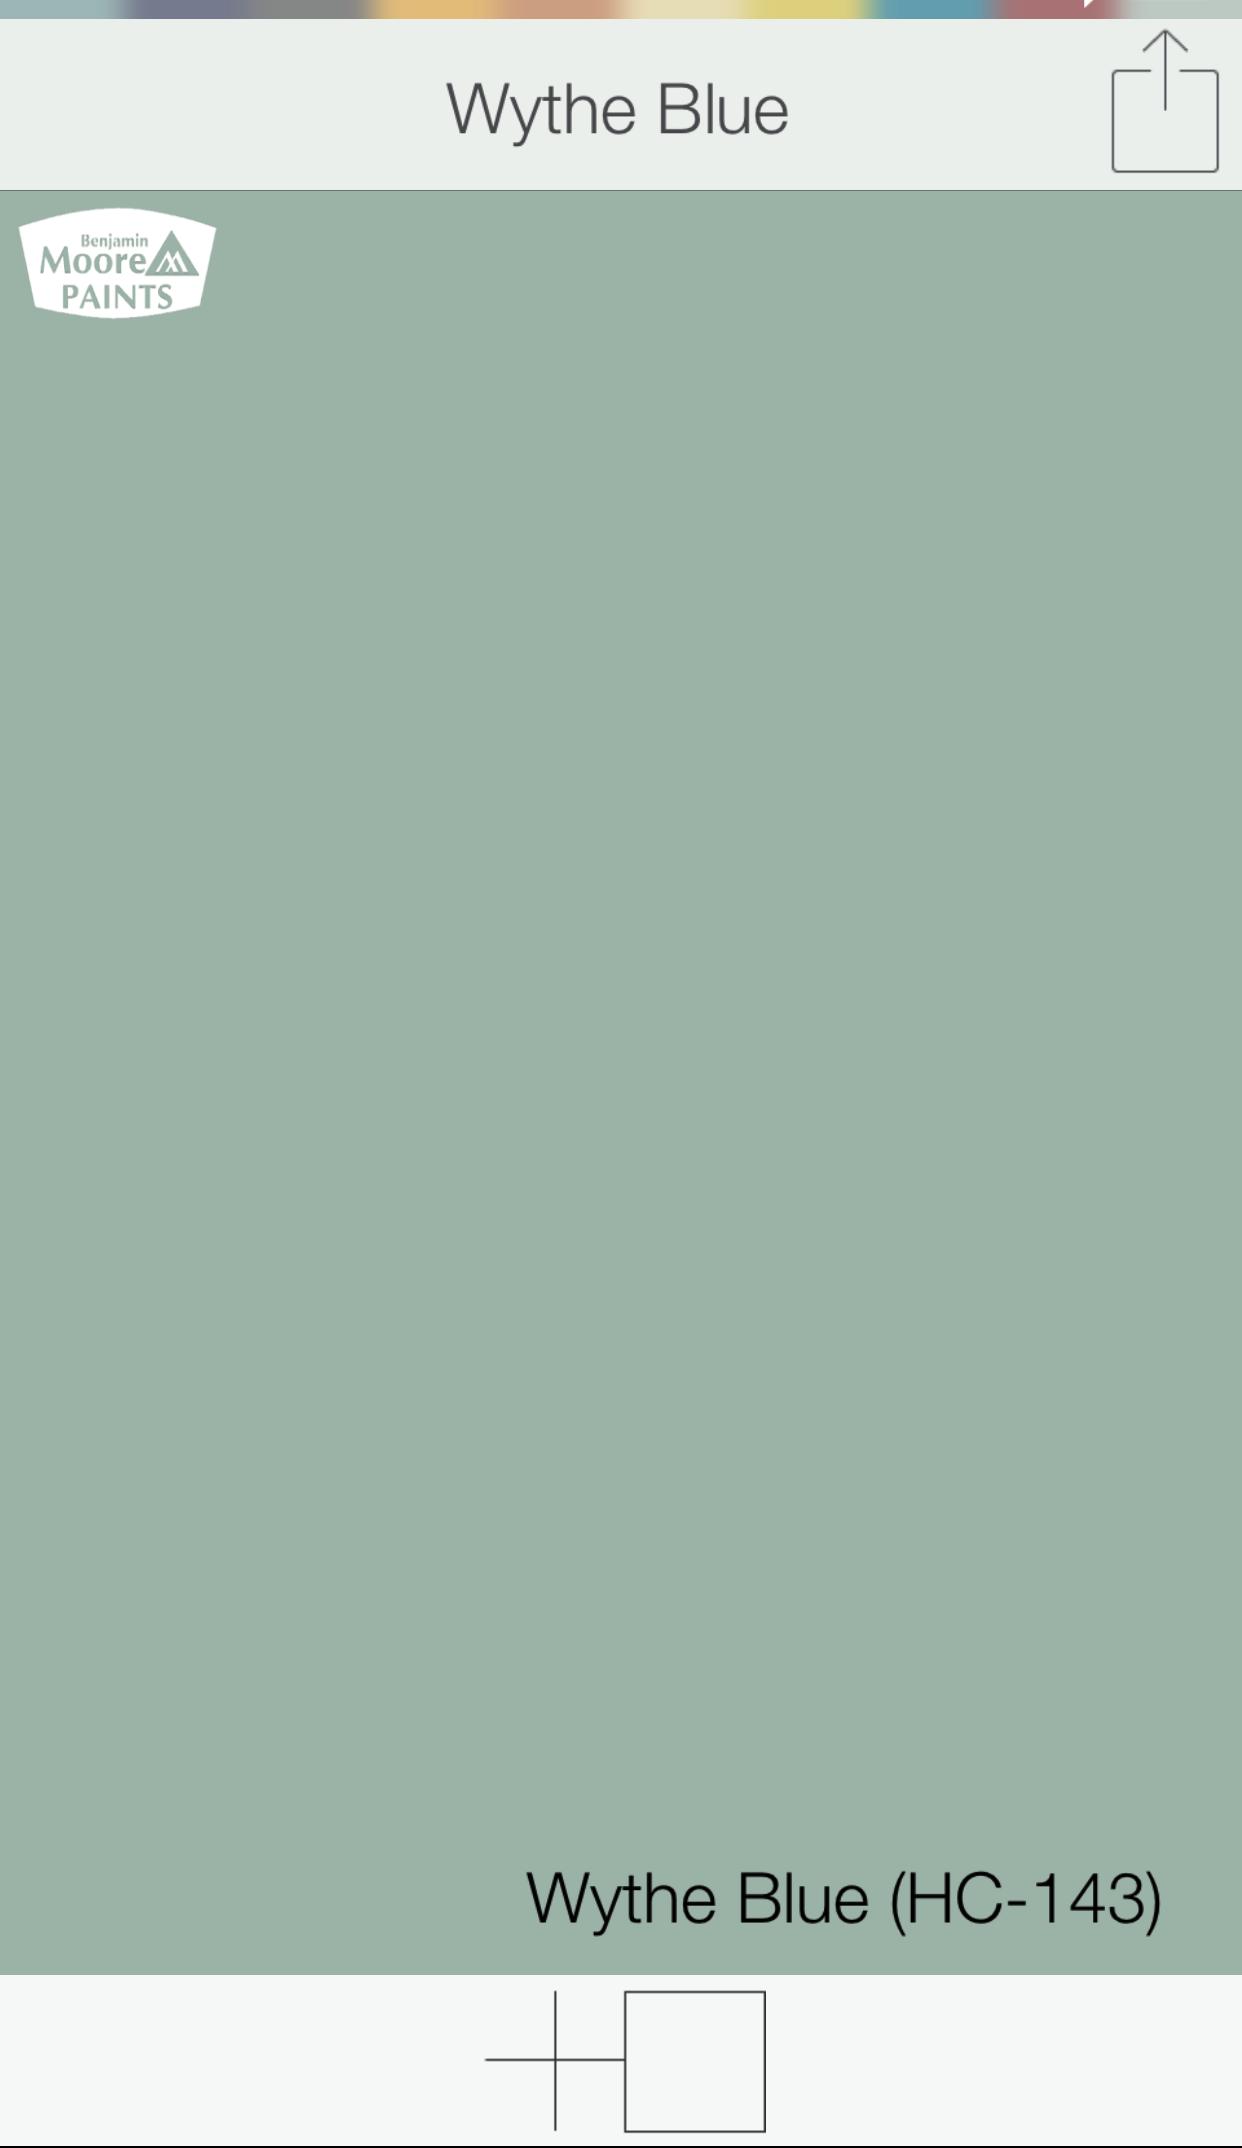 blue green front door colors wythe blue hc 143 benjamin moore paints swatchdeck app use. Black Bedroom Furniture Sets. Home Design Ideas